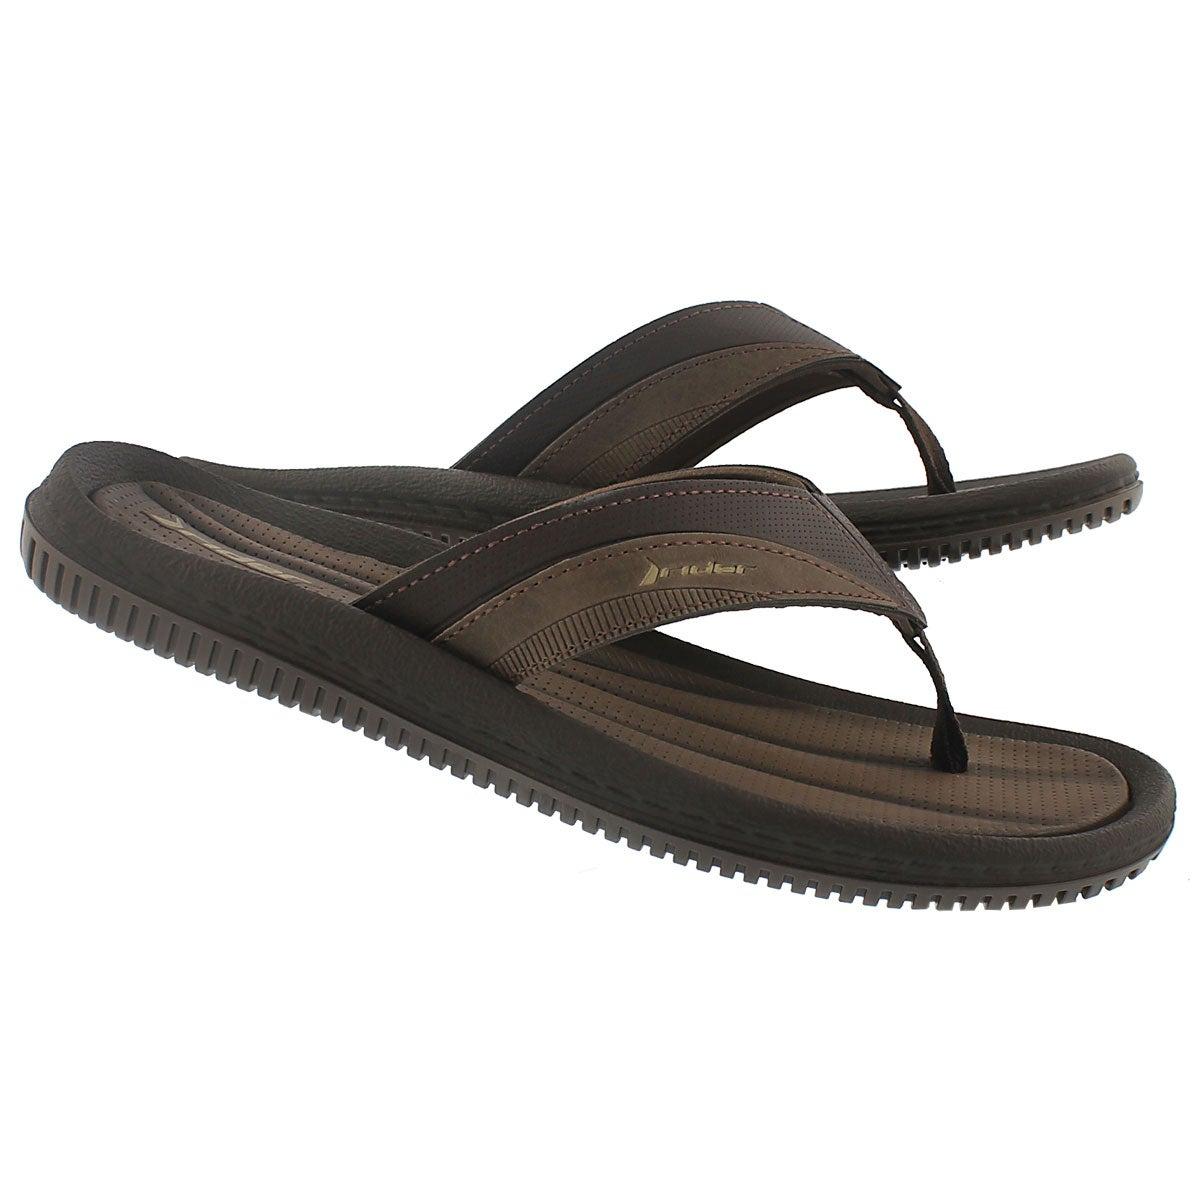 Sandale tong DUNAS XI, brun, hommes